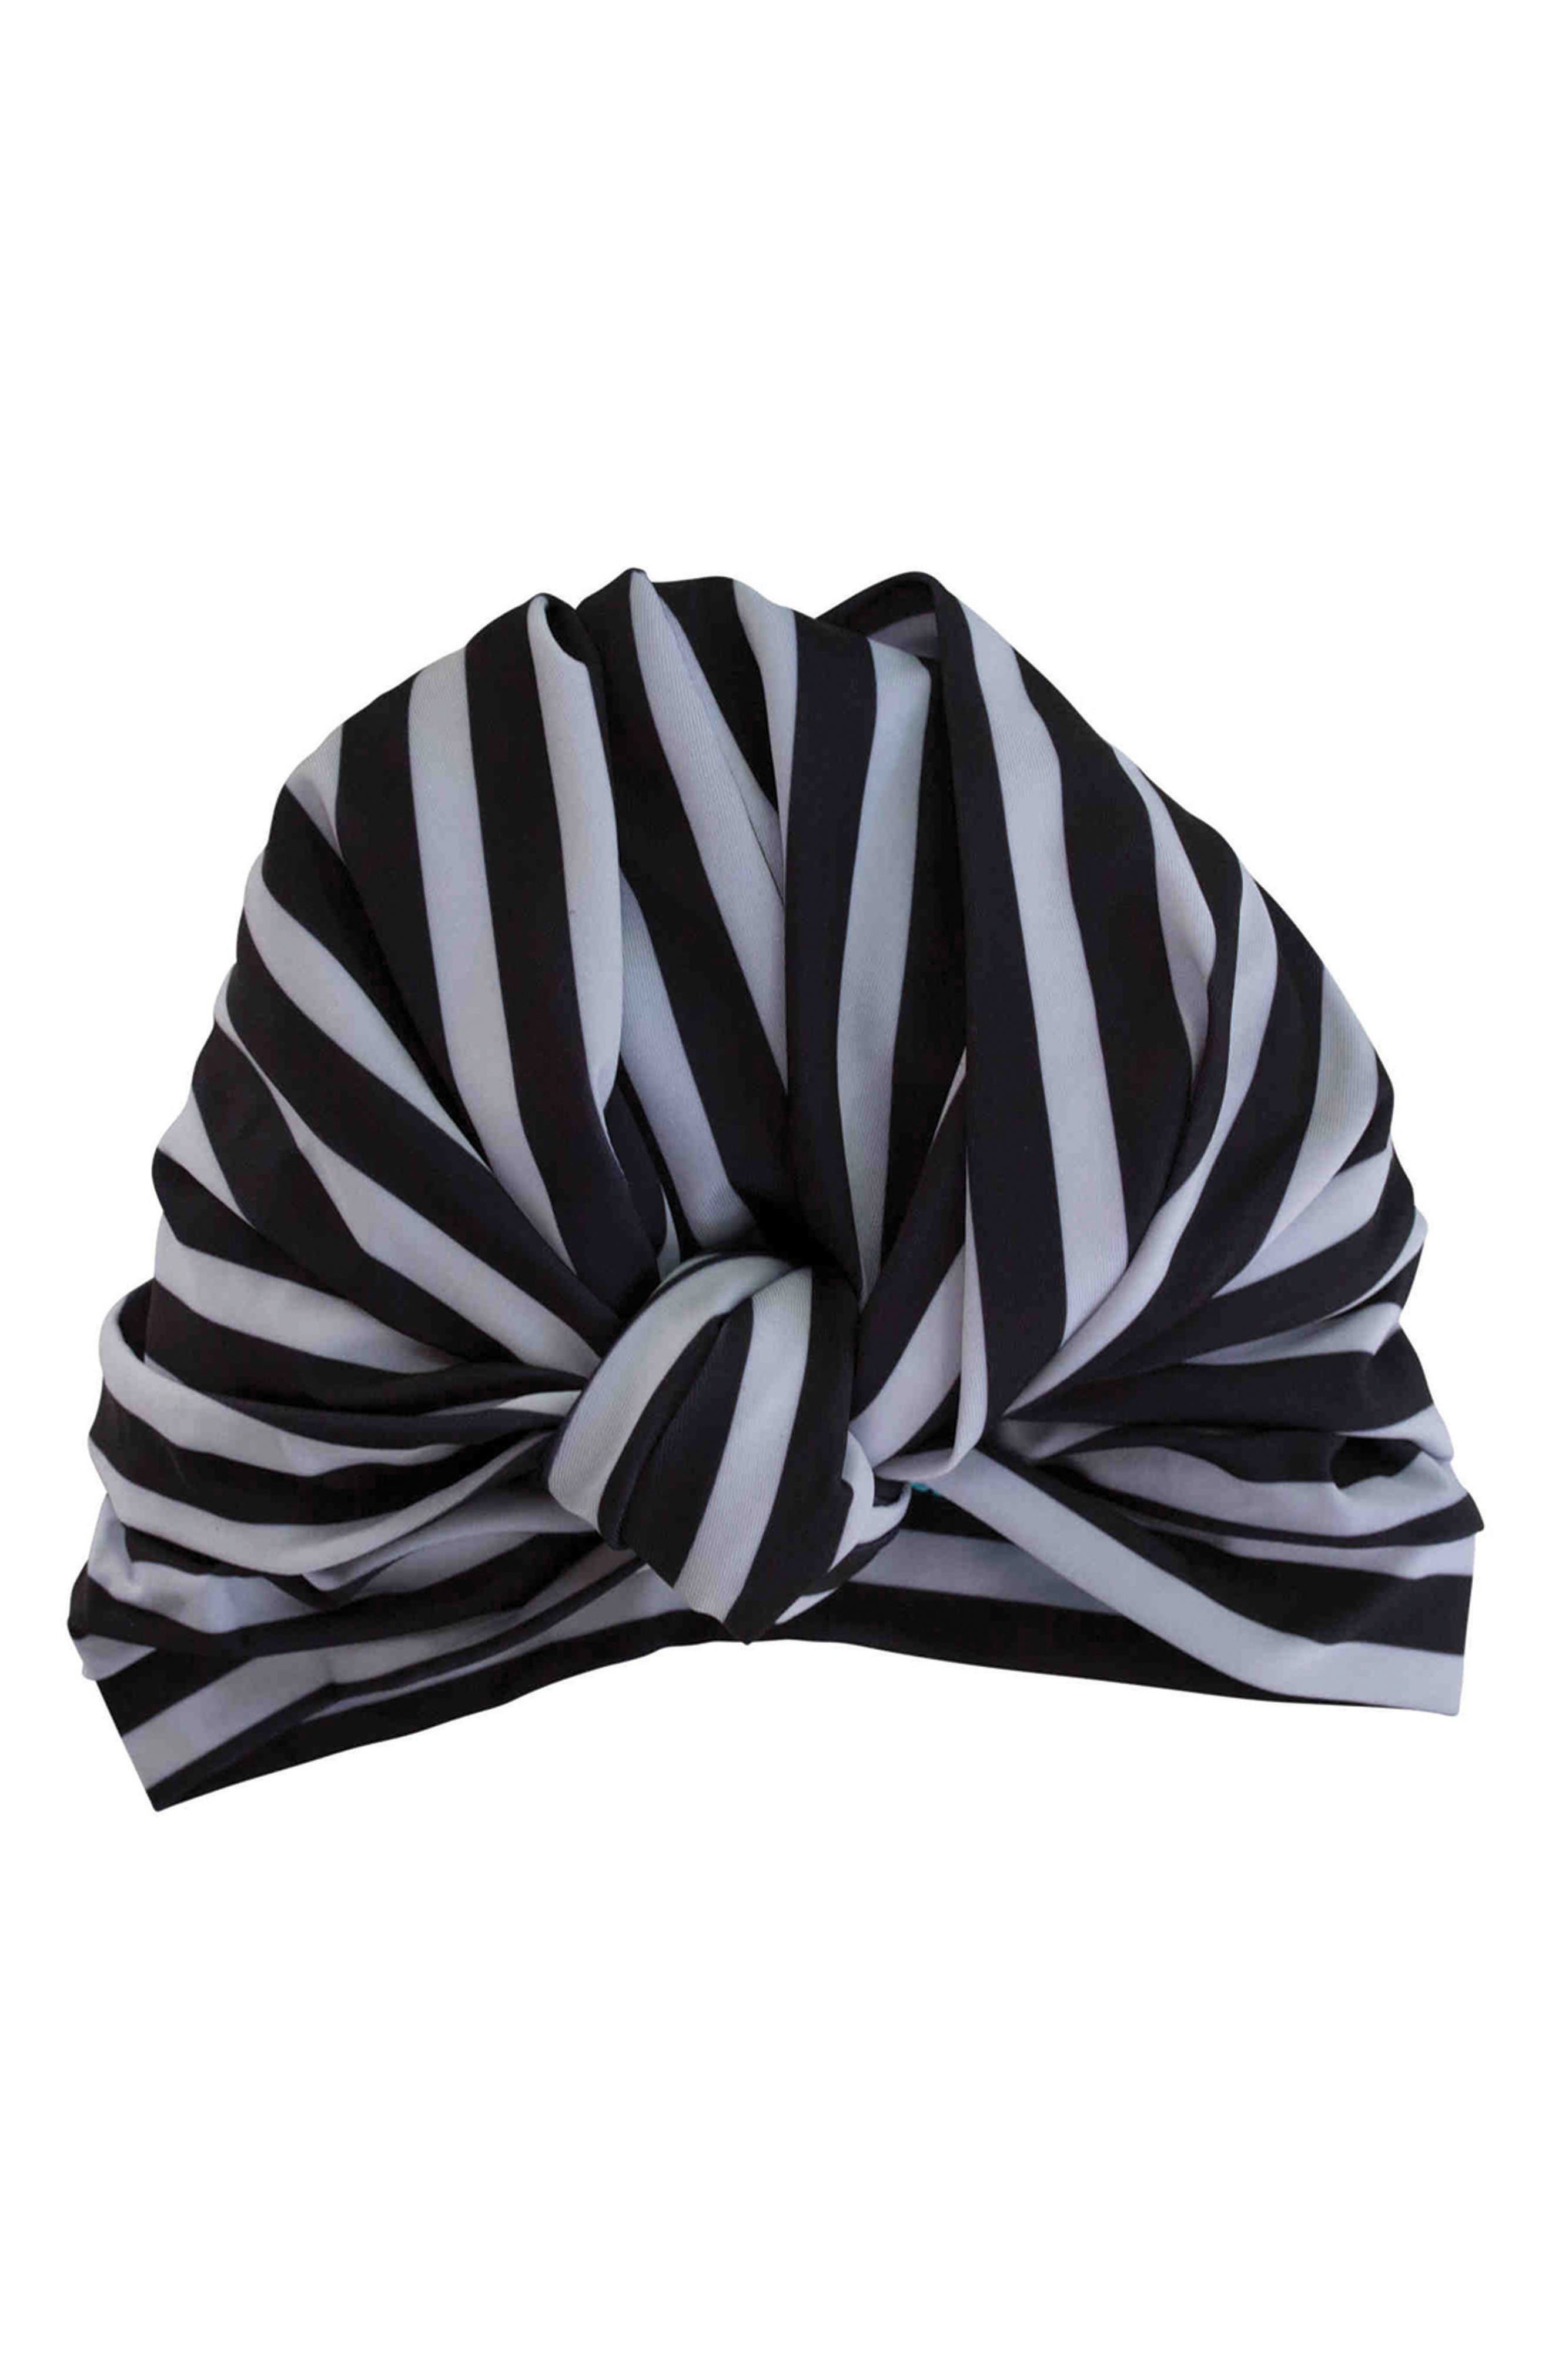 Dahlia Turban Shower Cap,                             Main thumbnail 1, color,                             MONOCHROME STRIPE